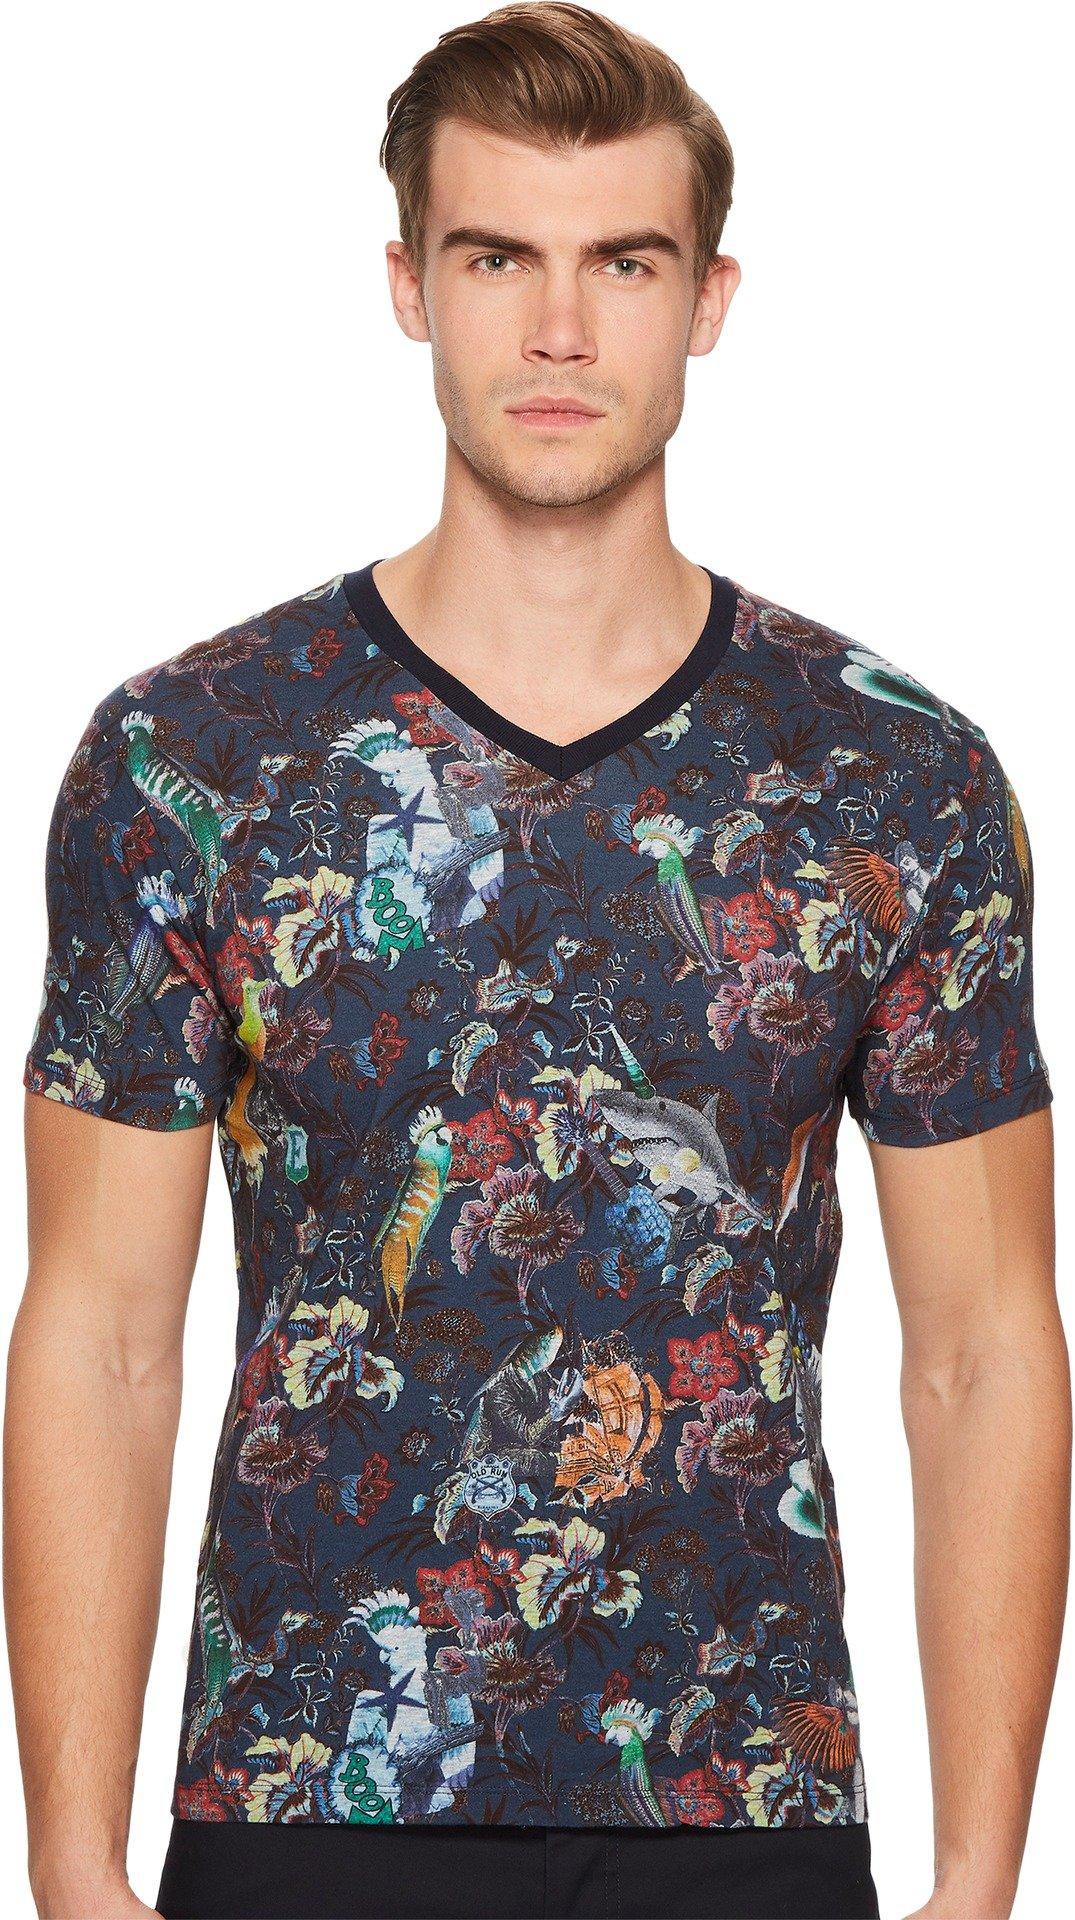 ETRO Men's Blossom T-Shirt Navy X-Large